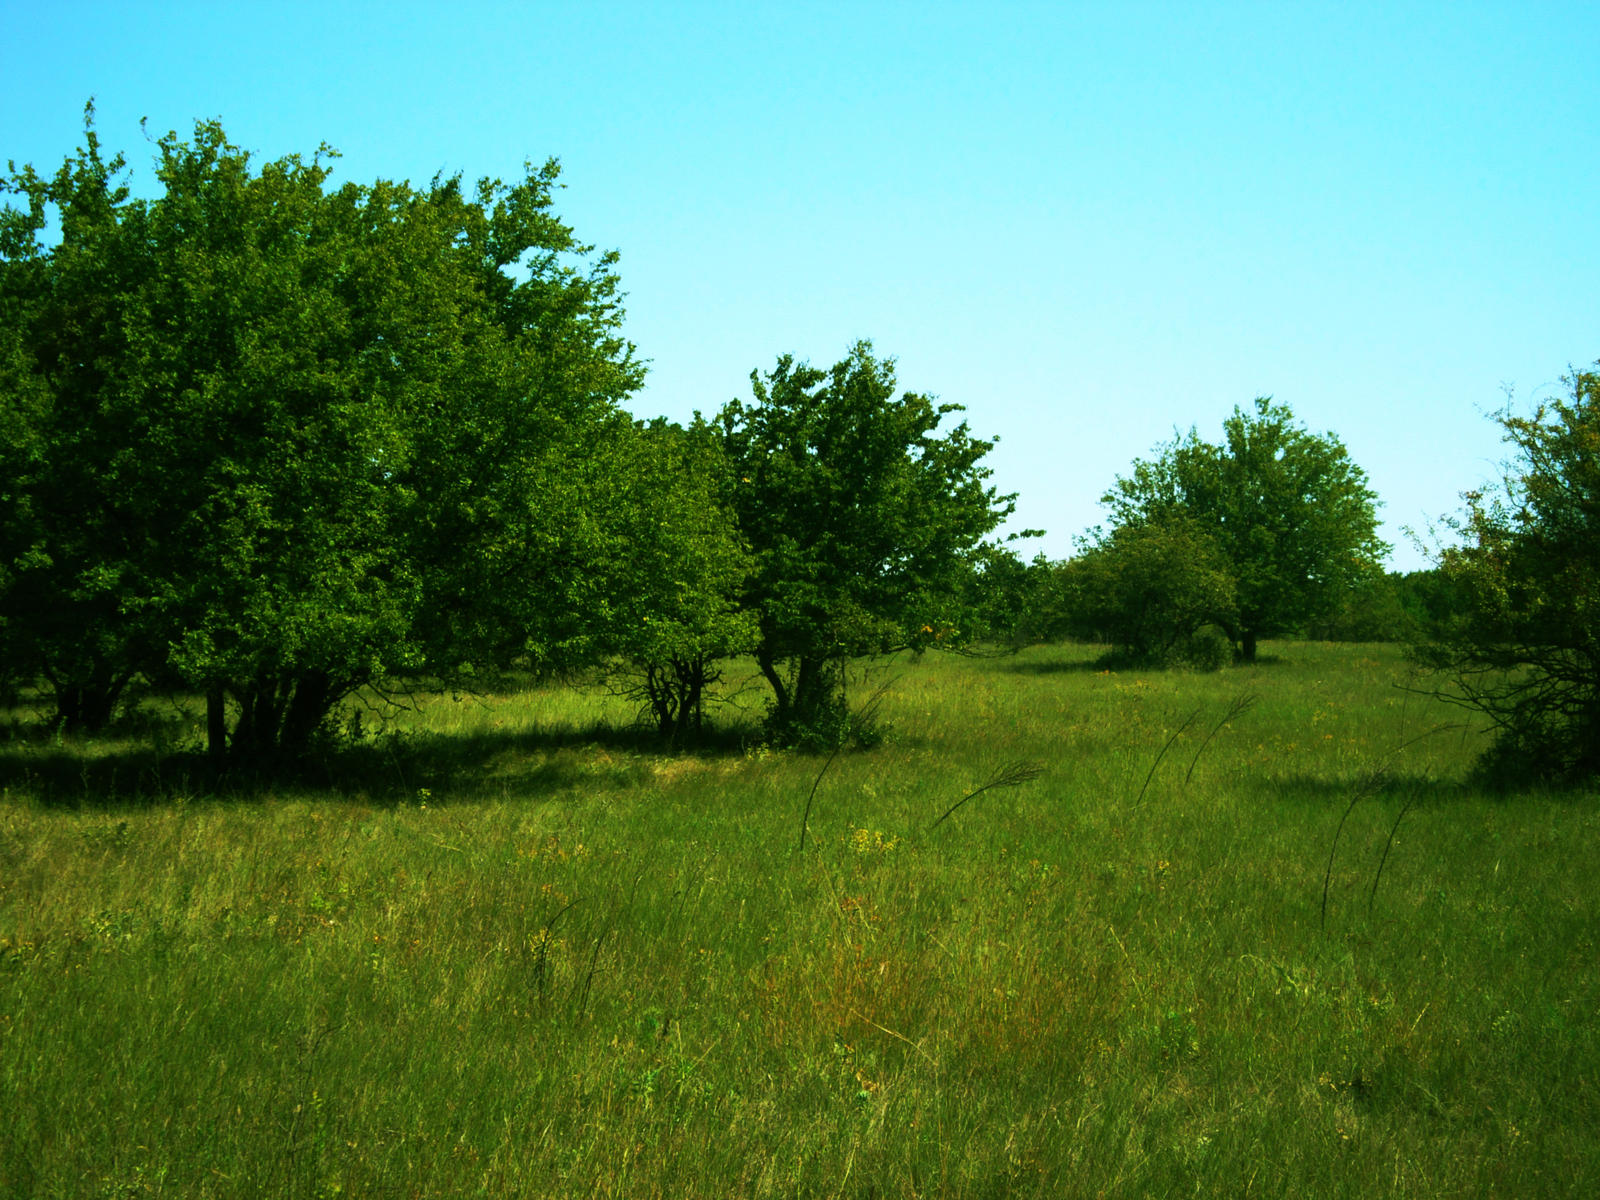 Grassy Fields by nirnaet on deviantART